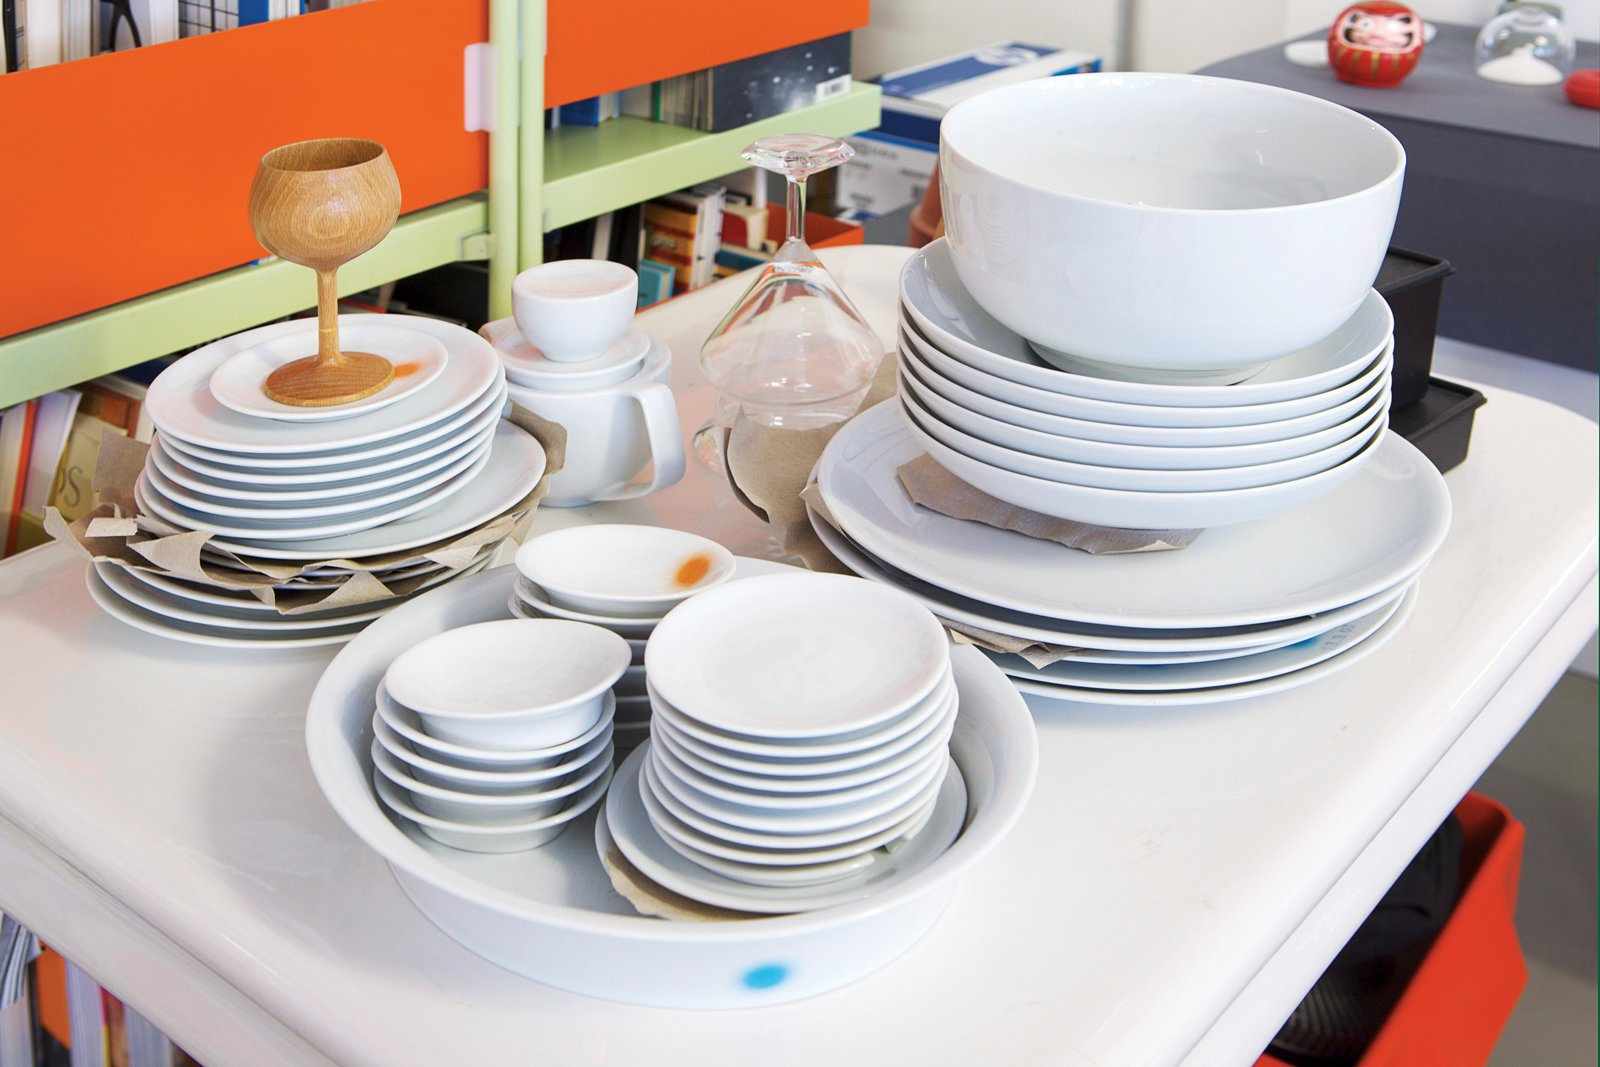 Grcic is a very hands-on designer, whose work includes tableware.  Photo 17 of 26 in Industrial Designer Focus: Konstantin Grcic